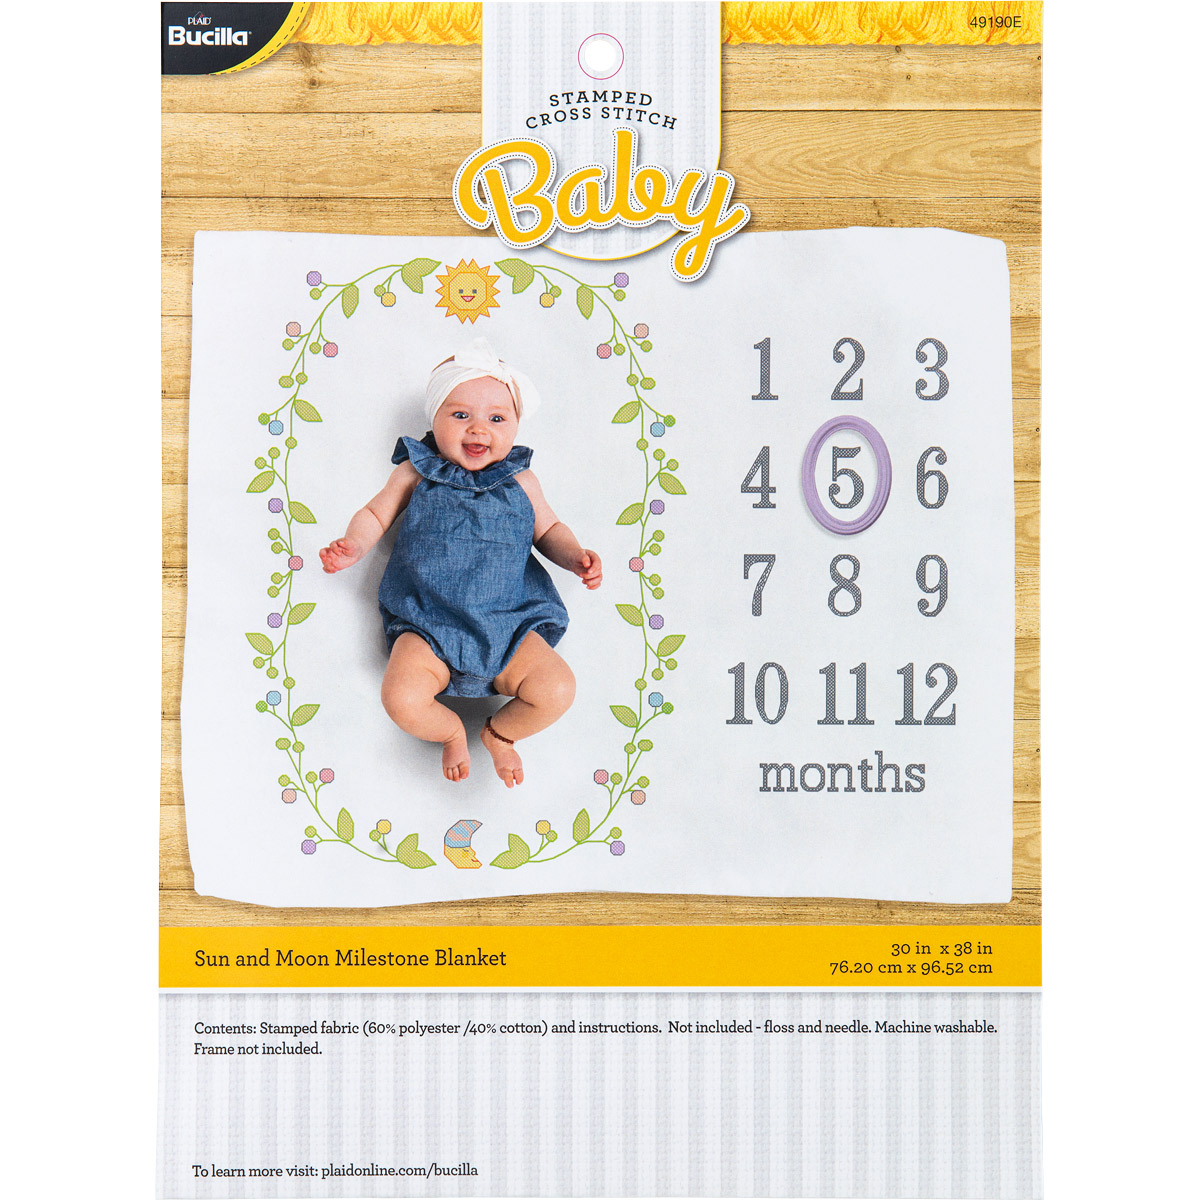 Bucilla ® Baby - Stamped Cross Stitch - Milestone Blanket, Sun and Moon